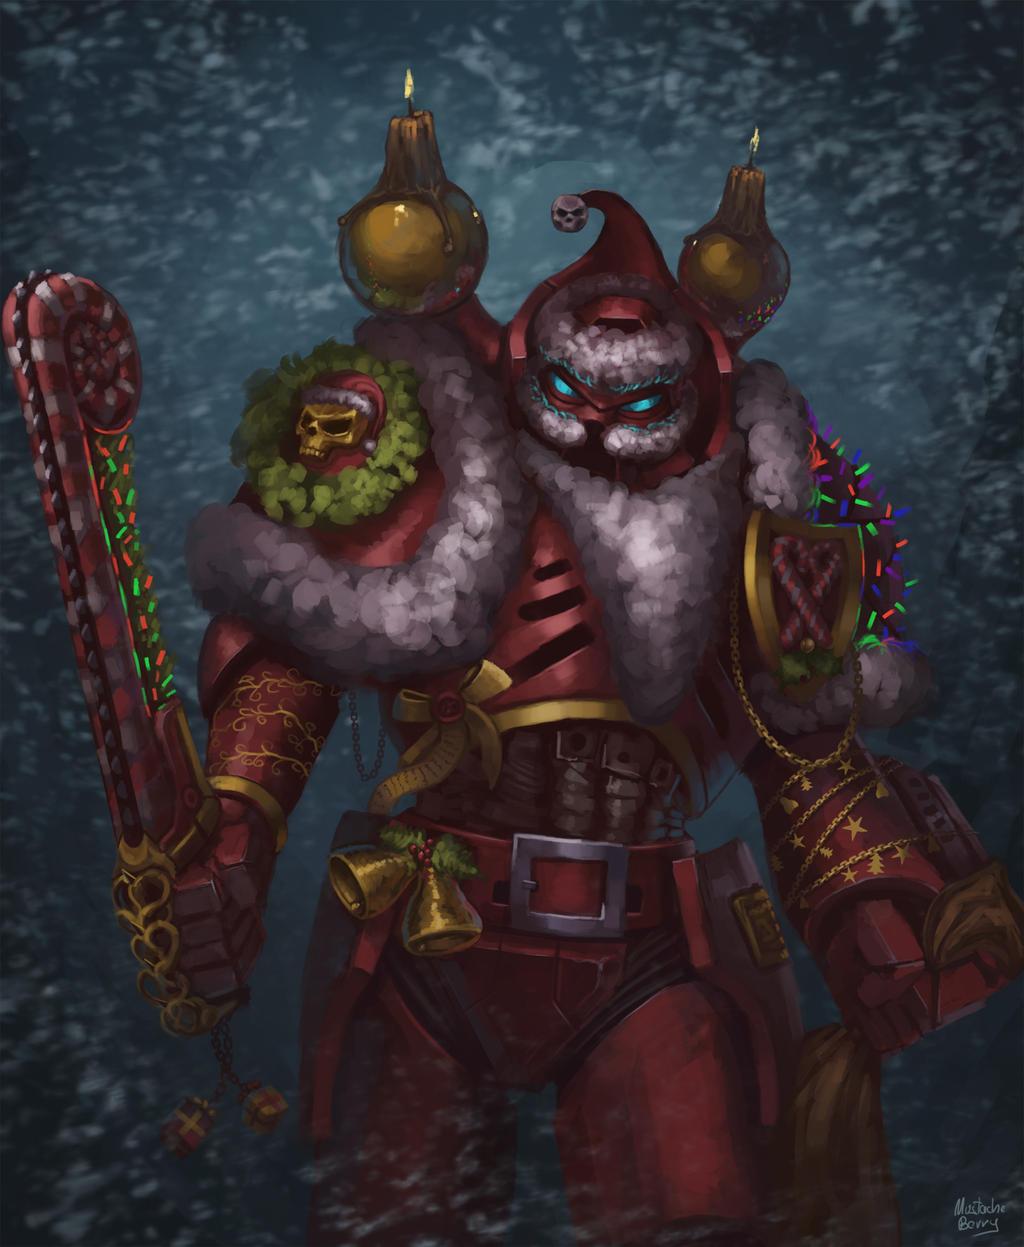 Merry Christmas 2015 - Warhammer style by GetsugaDante on DeviantArt